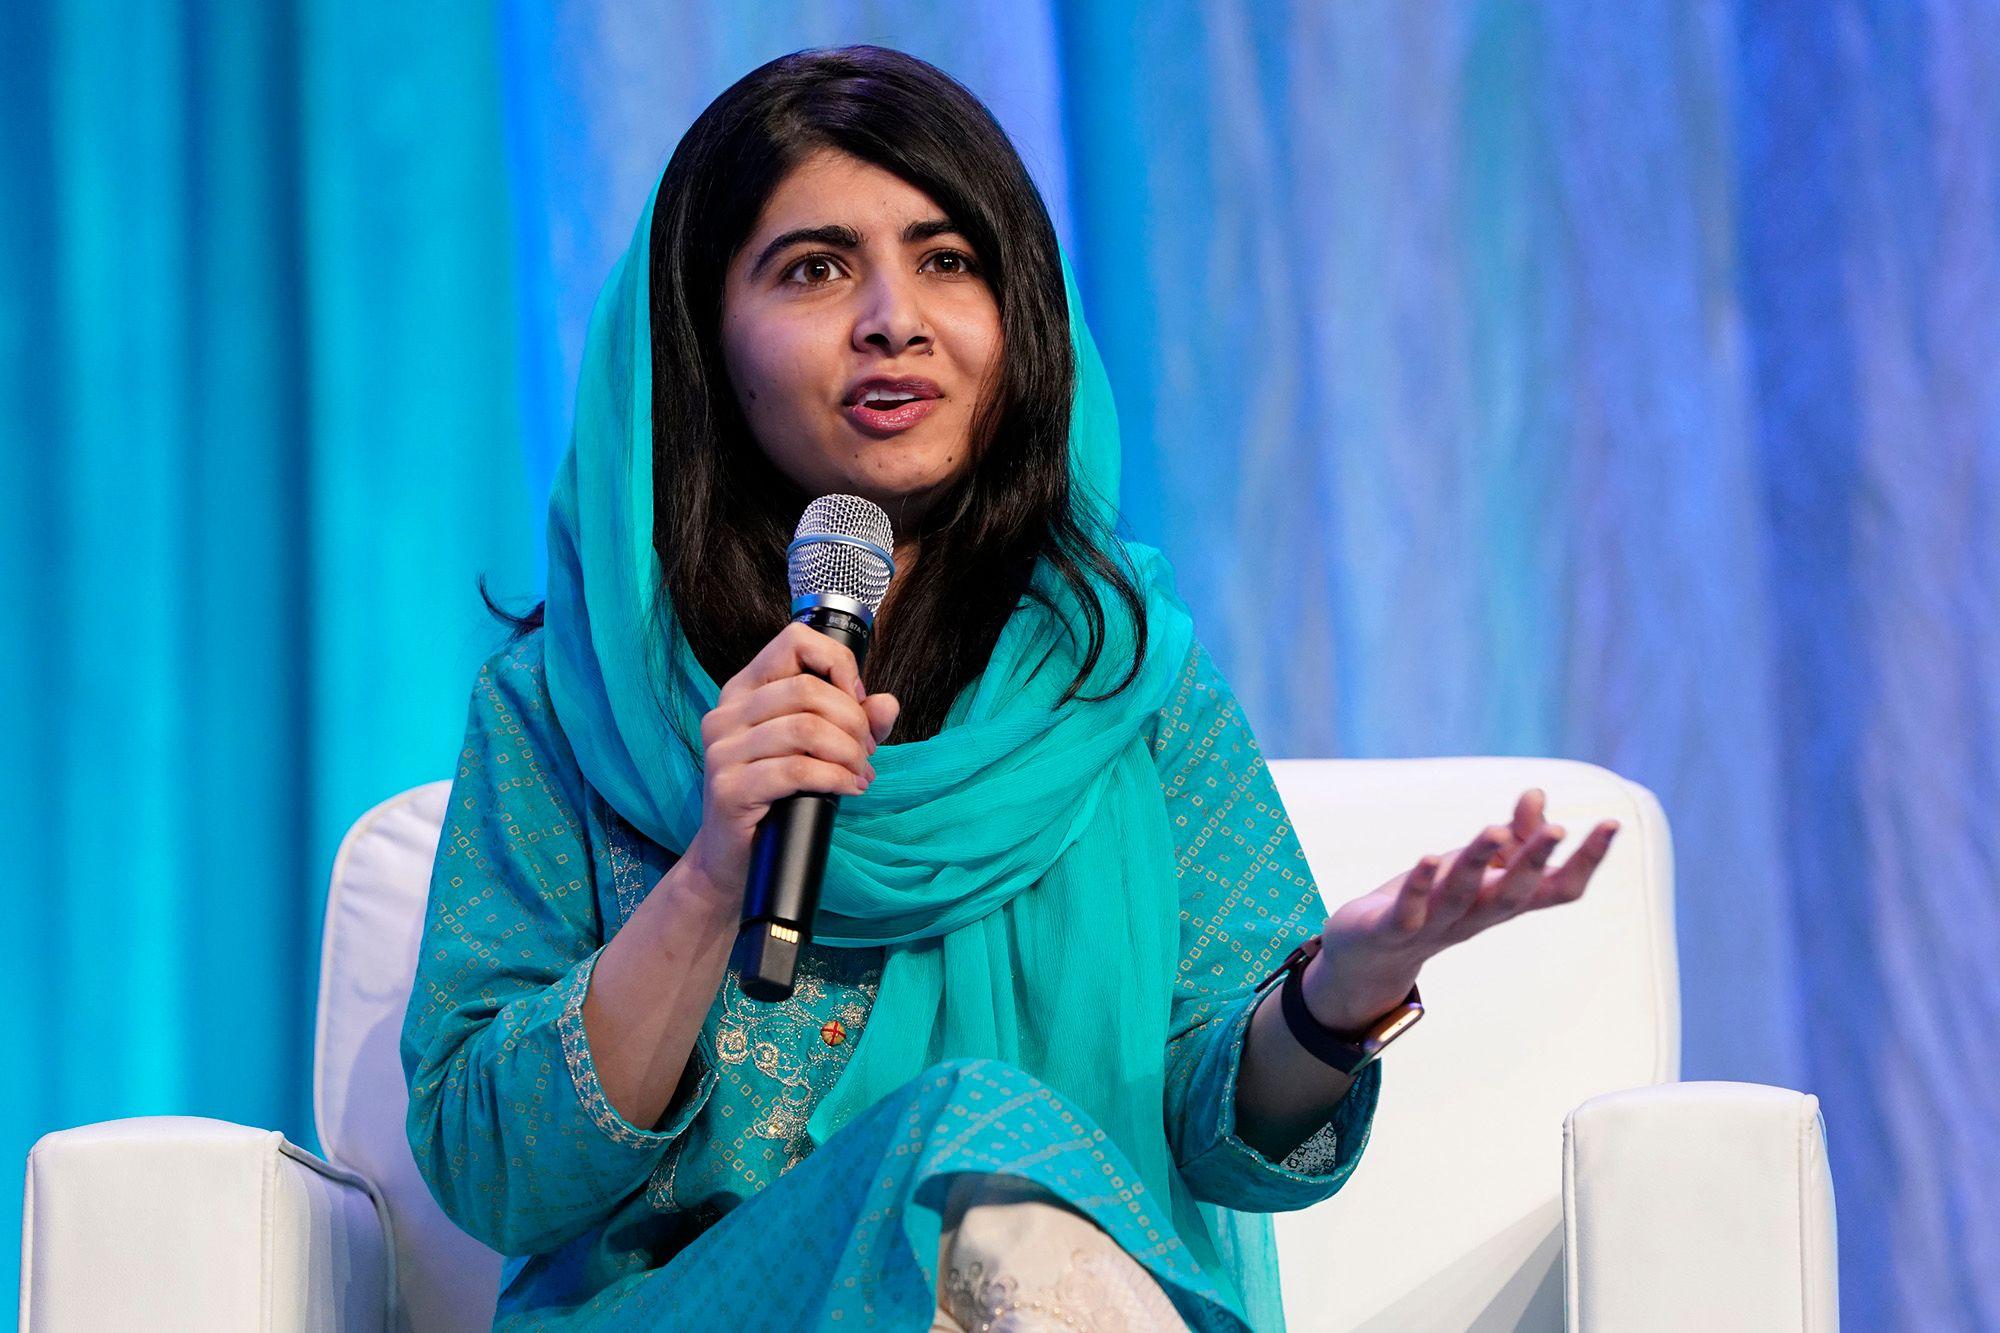 educating-women-reduces-the-likelihood-of-war-says-malala